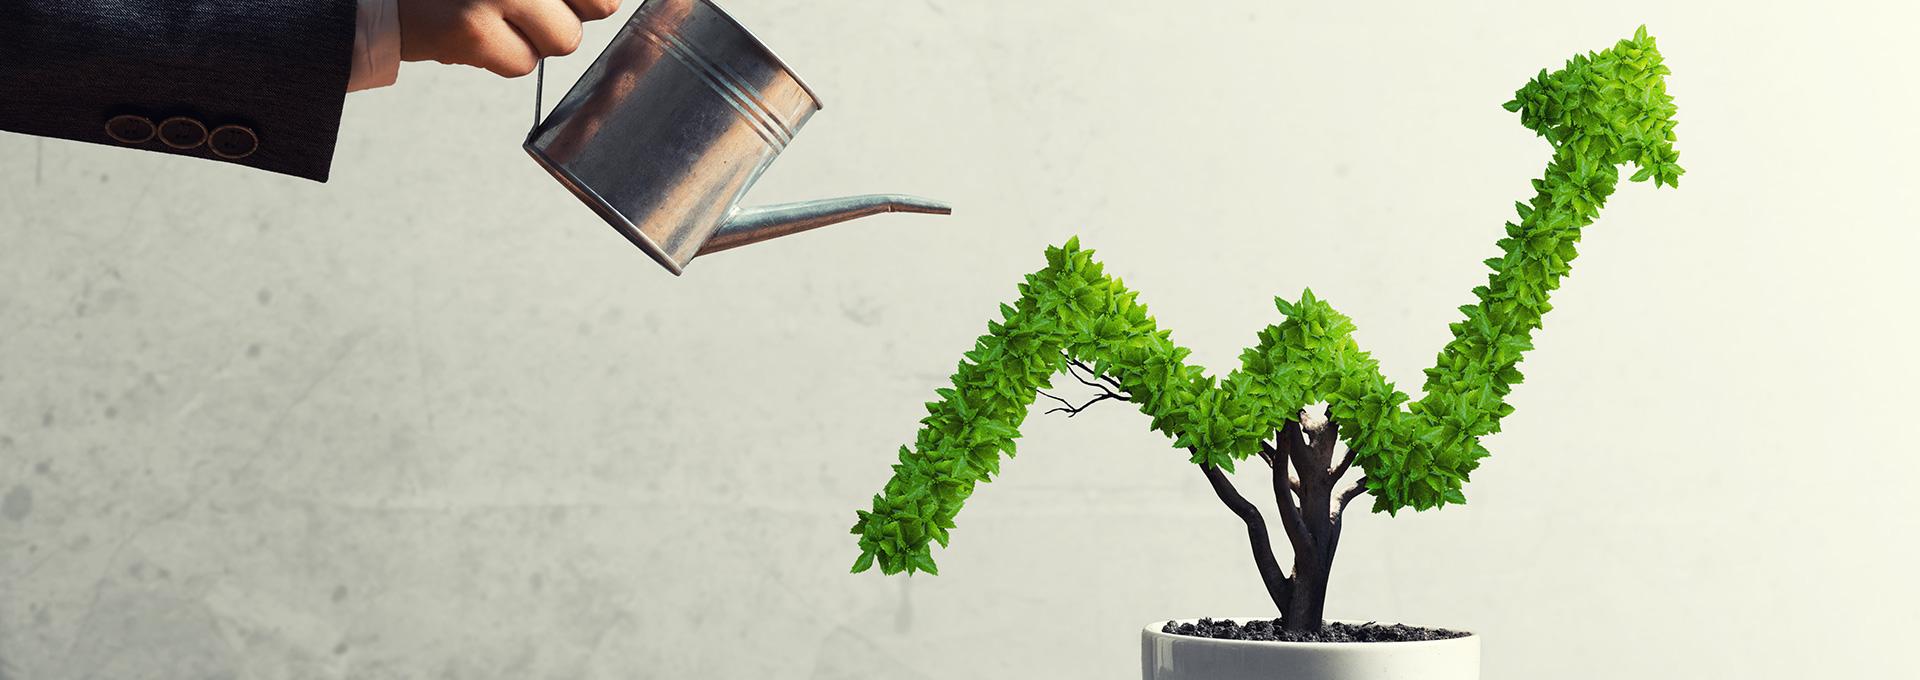 10 Business Growth Strategies to Skyrocketing Sales & Profits